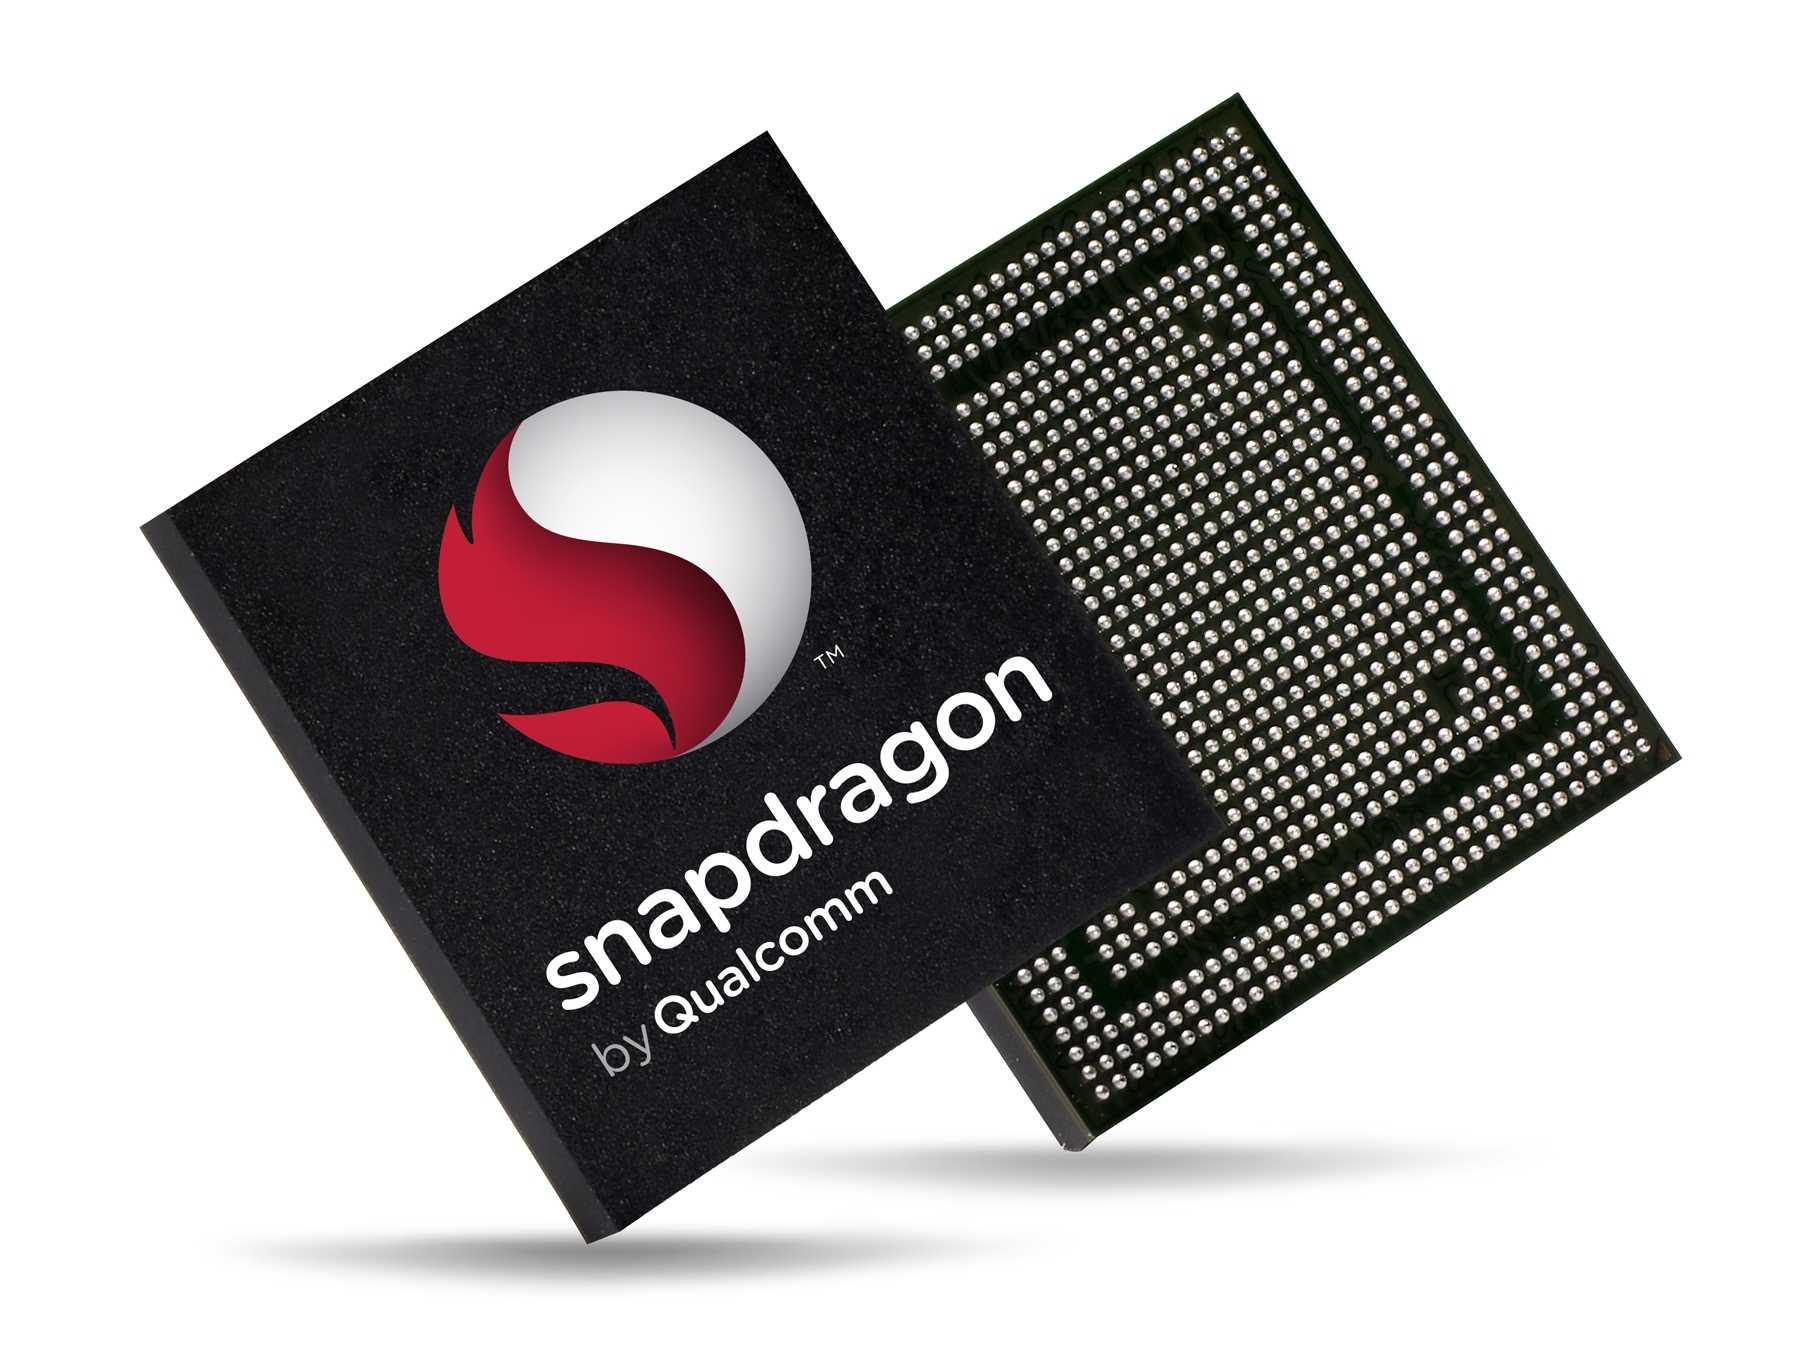 https://i1.wp.com/www.nashvillechatterclass.com/wp-content/uploads/2017/10/Qualcomm-Snapdragon-636-Processor-Supports-600-MBPS.jpeg